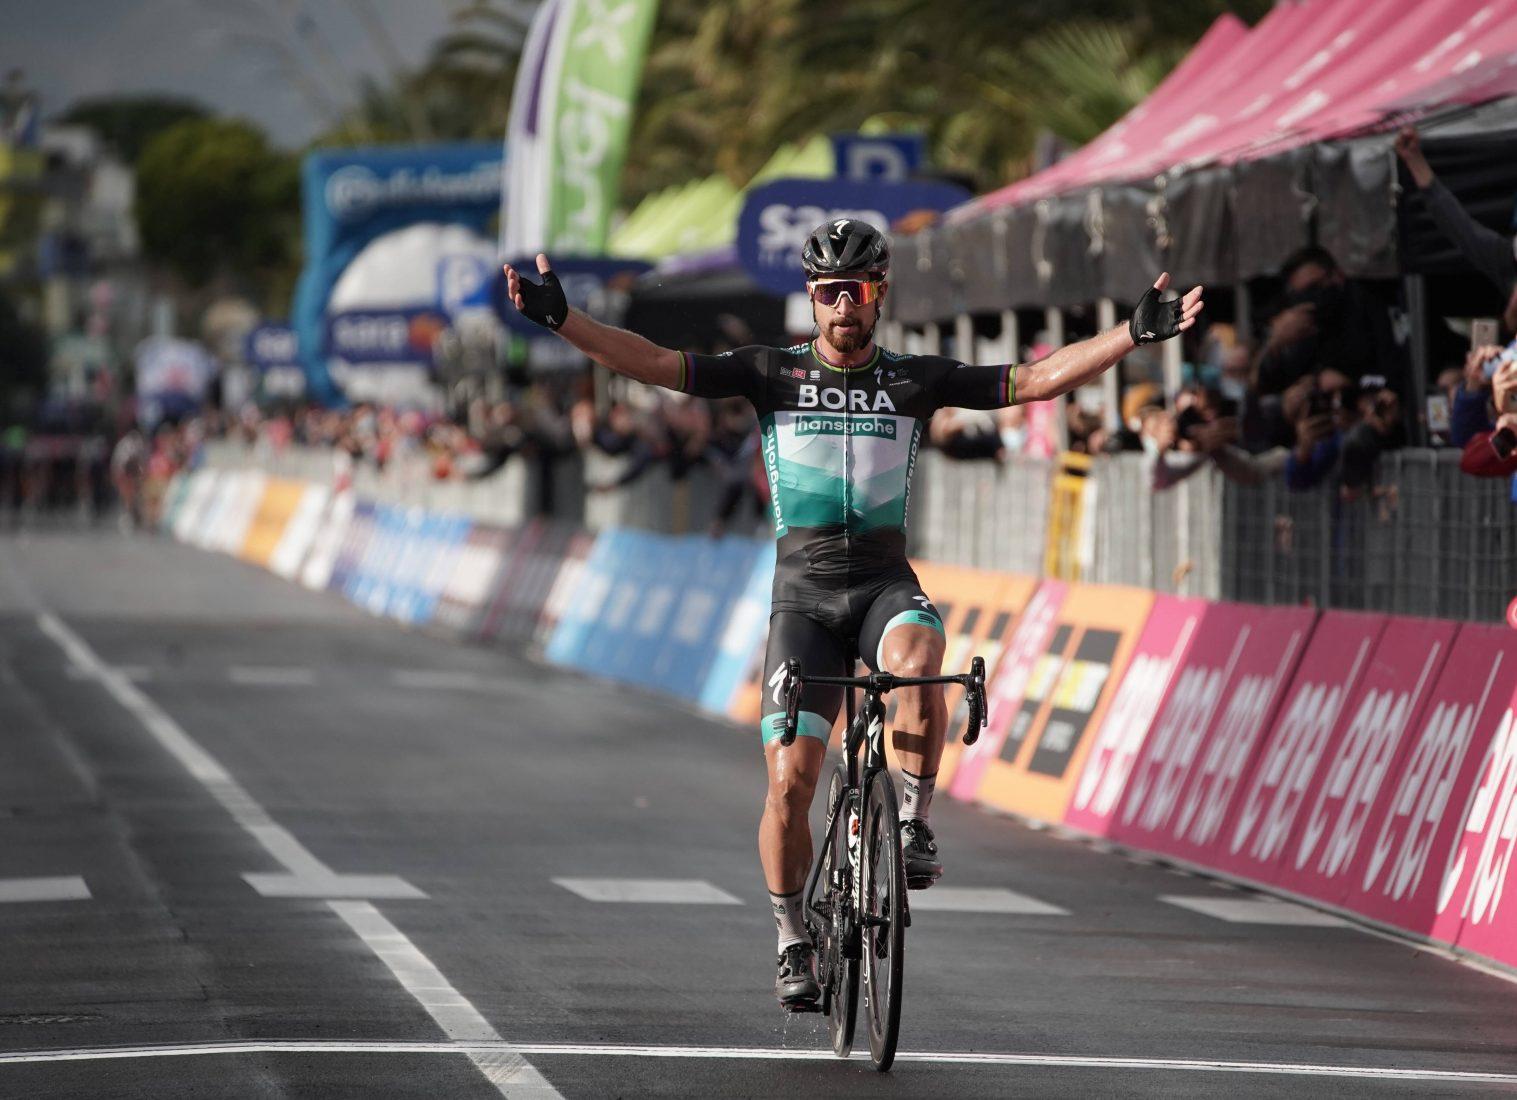 Giro 2020: Sagan, un arcobaleno sul Giro